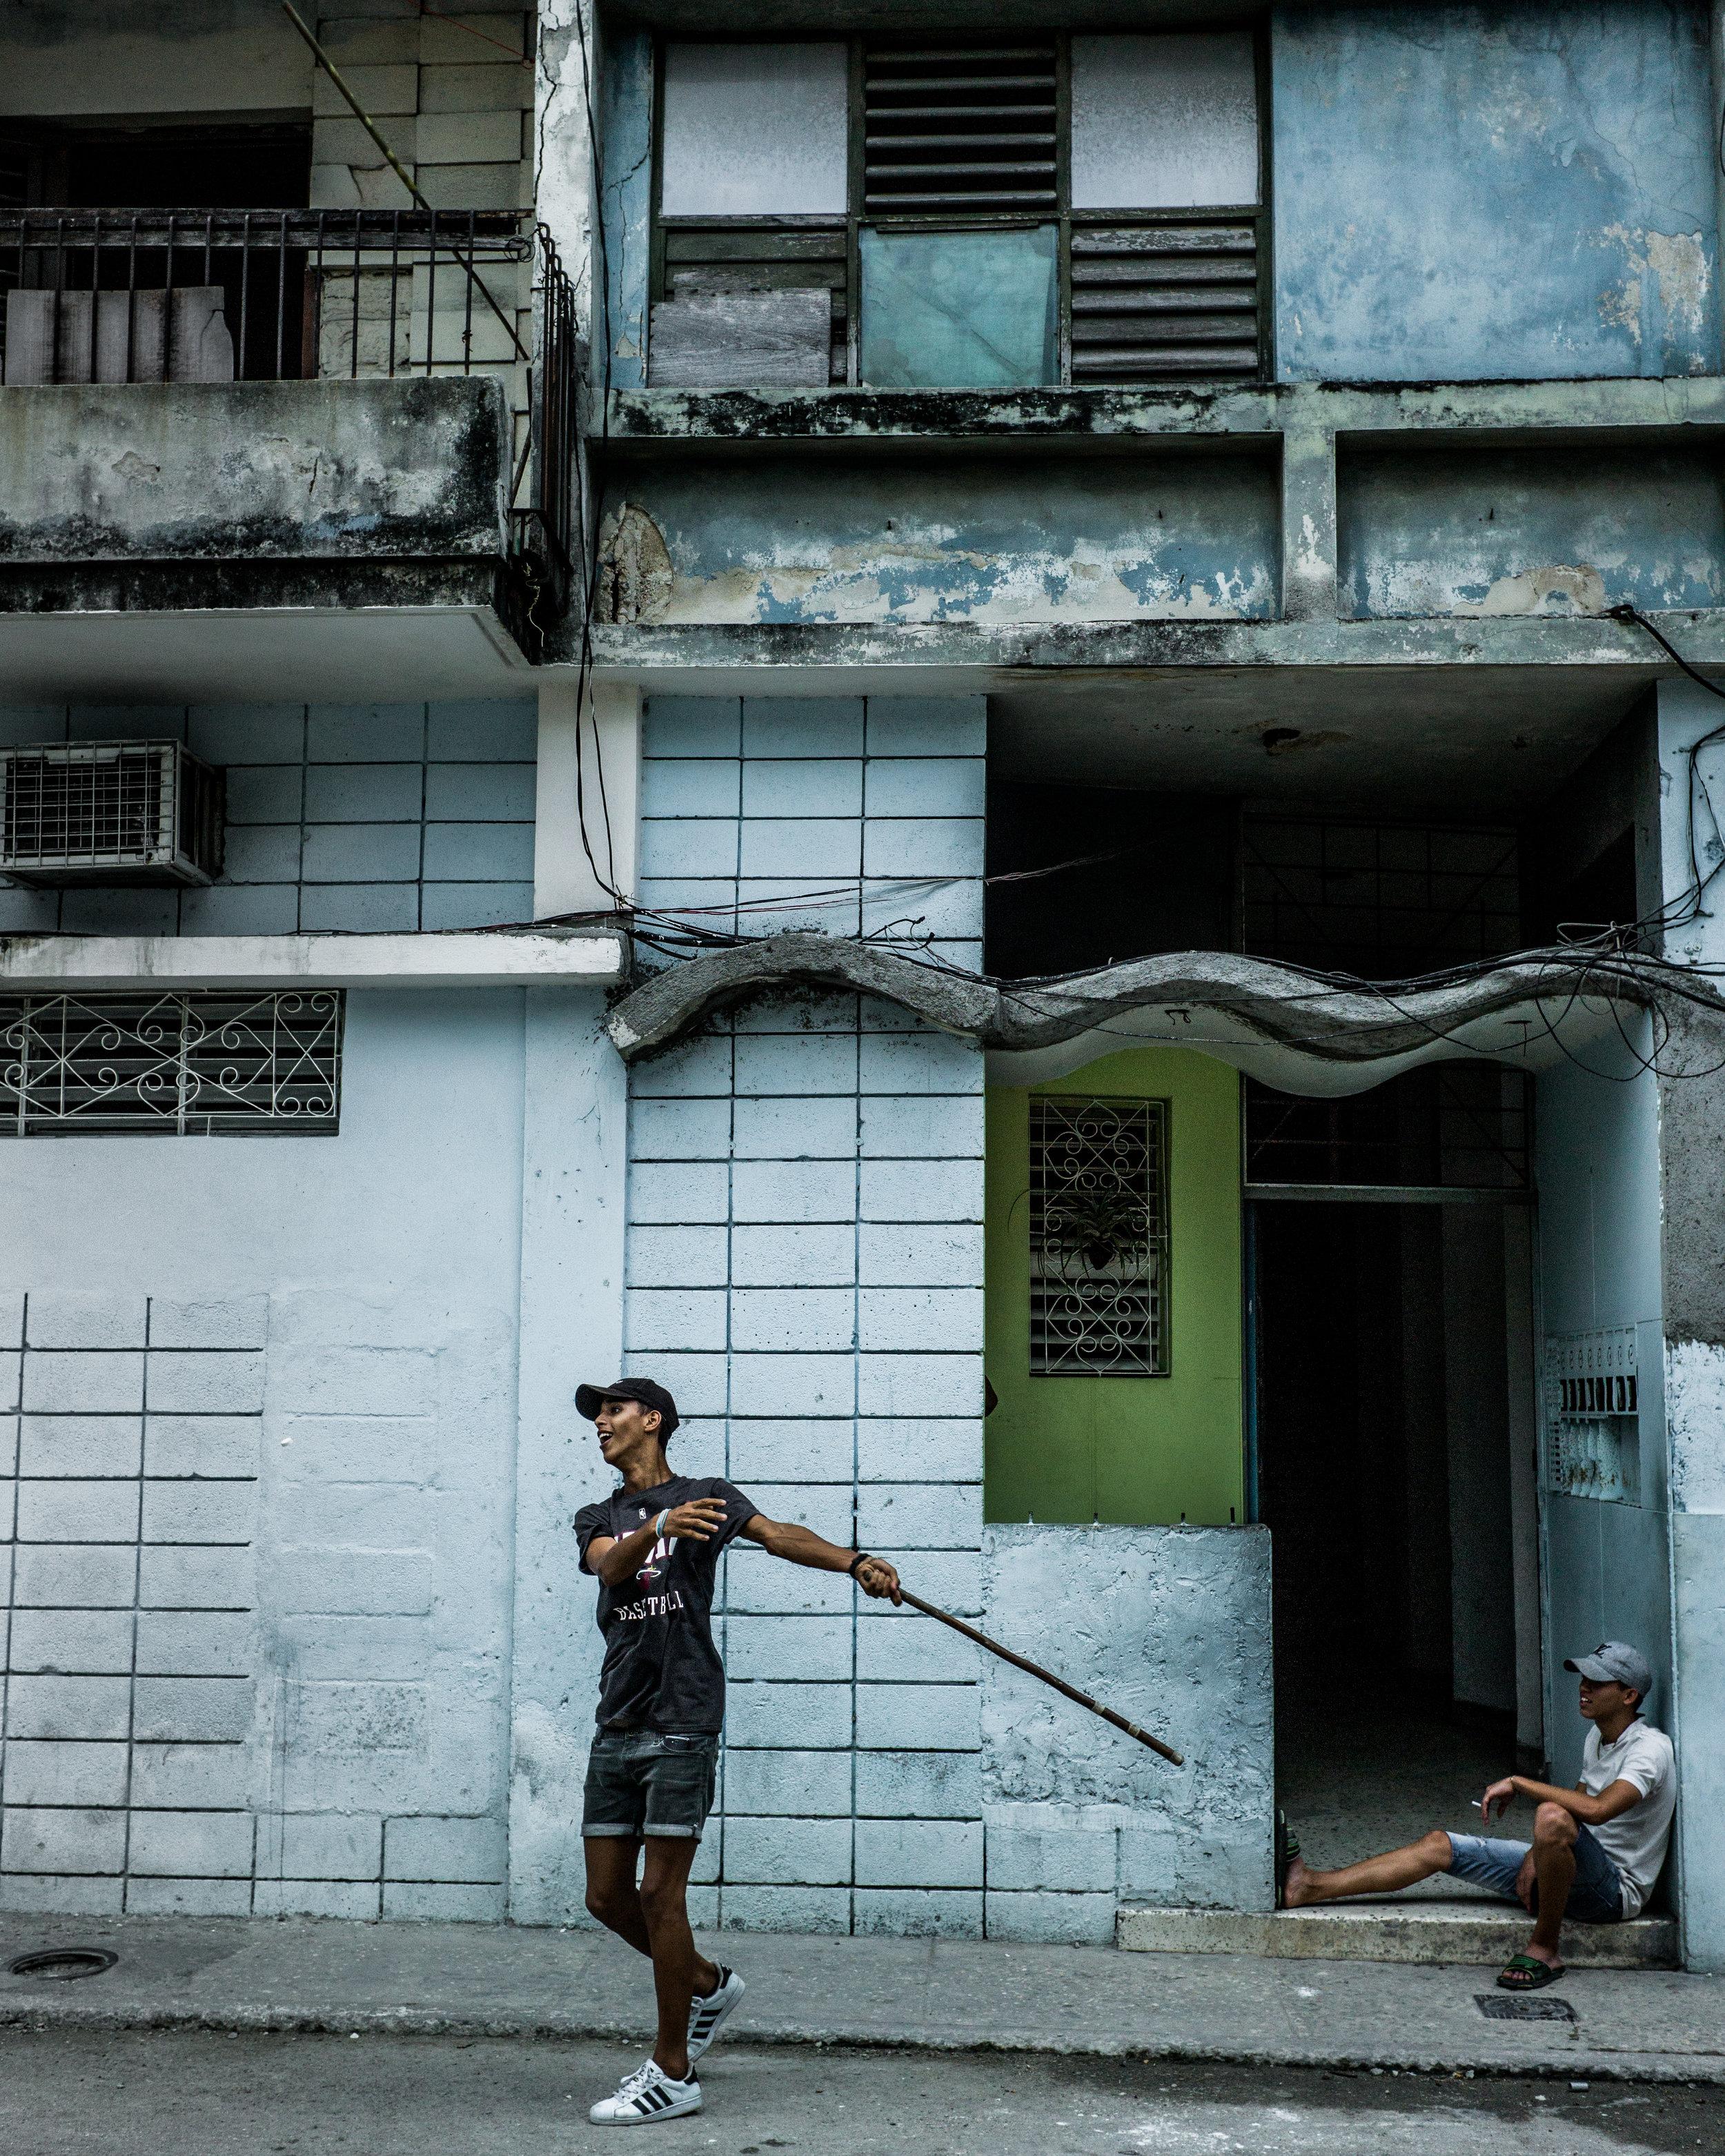 Calle_Cuba_FinEX-39.jpg